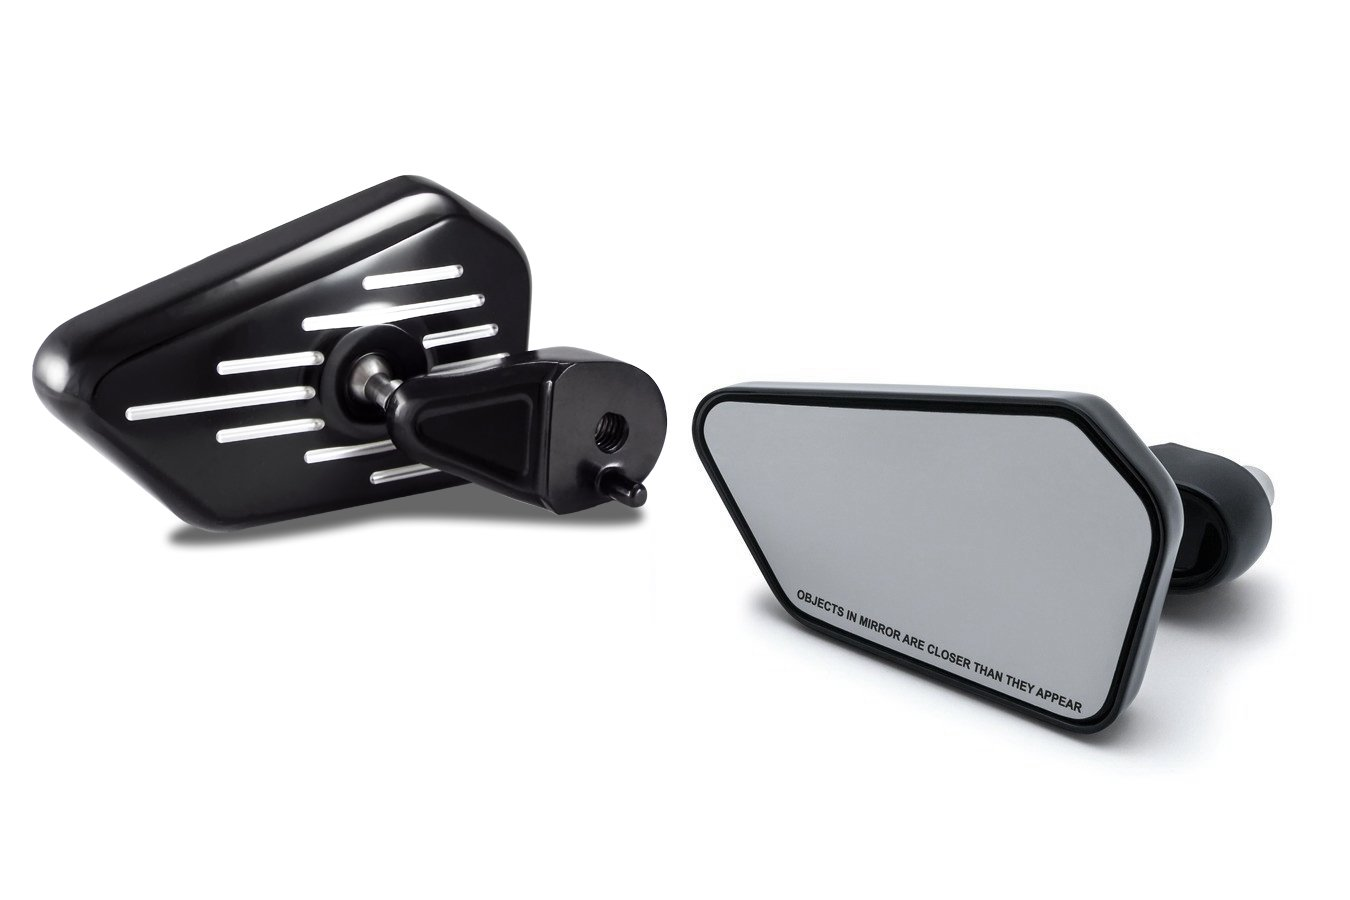 Bagger Brothers HD-MIR25K Elite Series Black Fairing Mounted Mirror for 2014 - 2018 Harley-Davidson FLH Touring Models